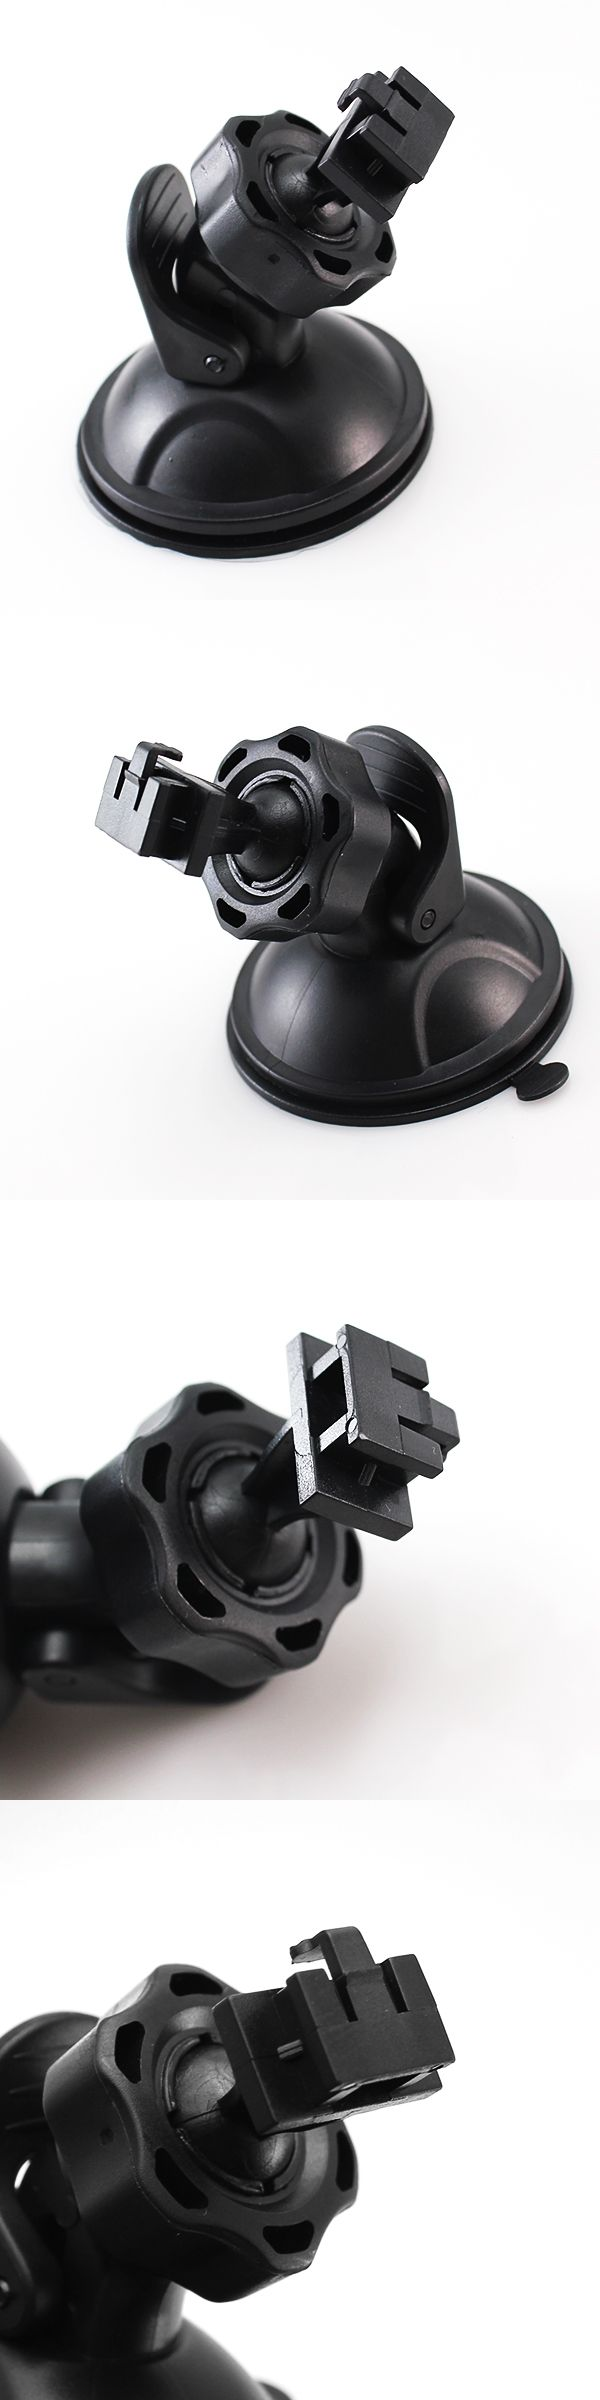 2017 Universal Mini Suction Cup Mount Holder Sucker Bracket Black PVC Holder Bracket Mount for Car GPS DV DVR Camera